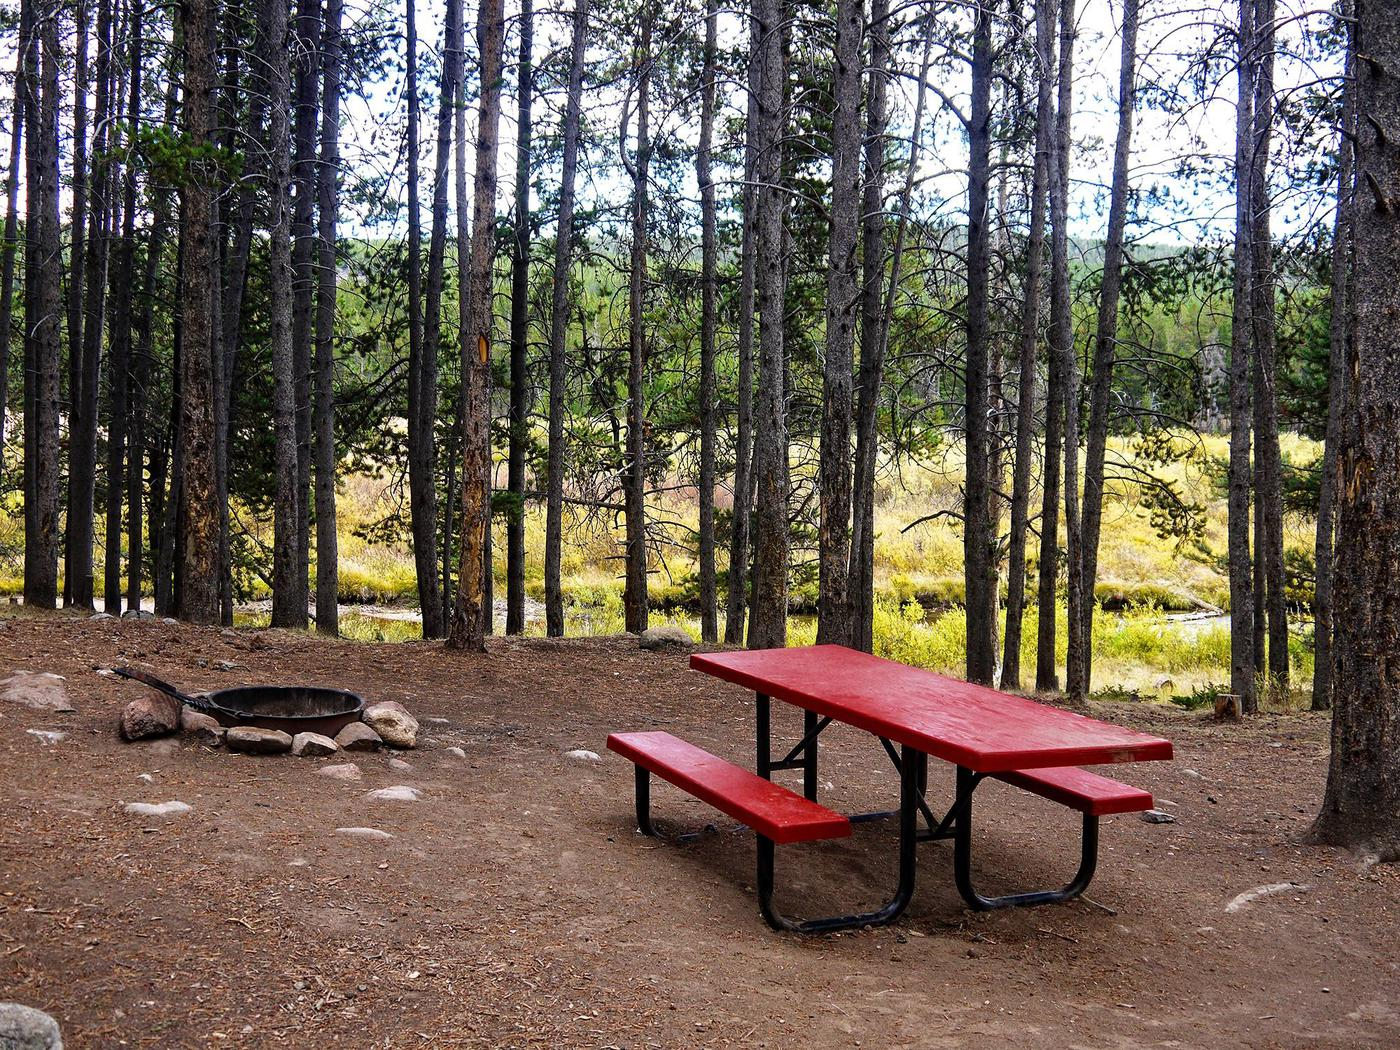 ip_site08_previewIsland Park Site 8